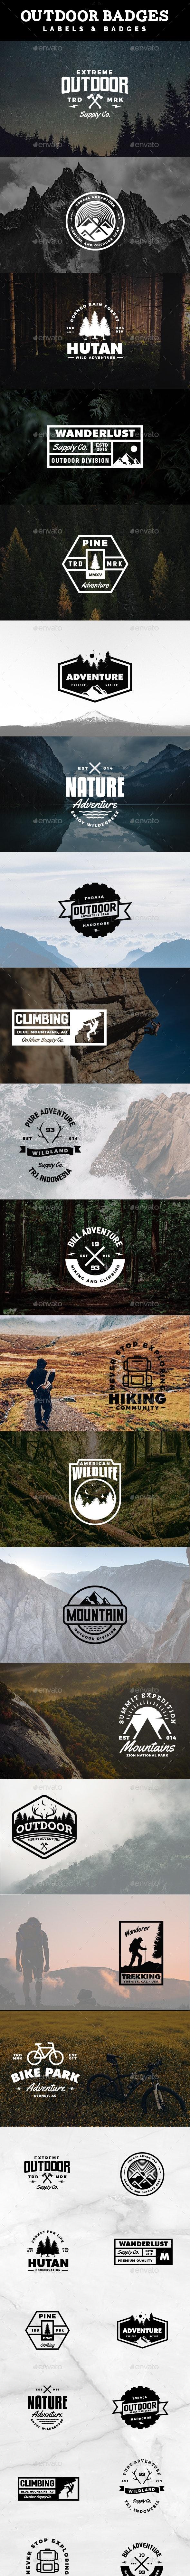 Adventure Labels and Badges Vol. 3 - Badges & Stickers Web Elements